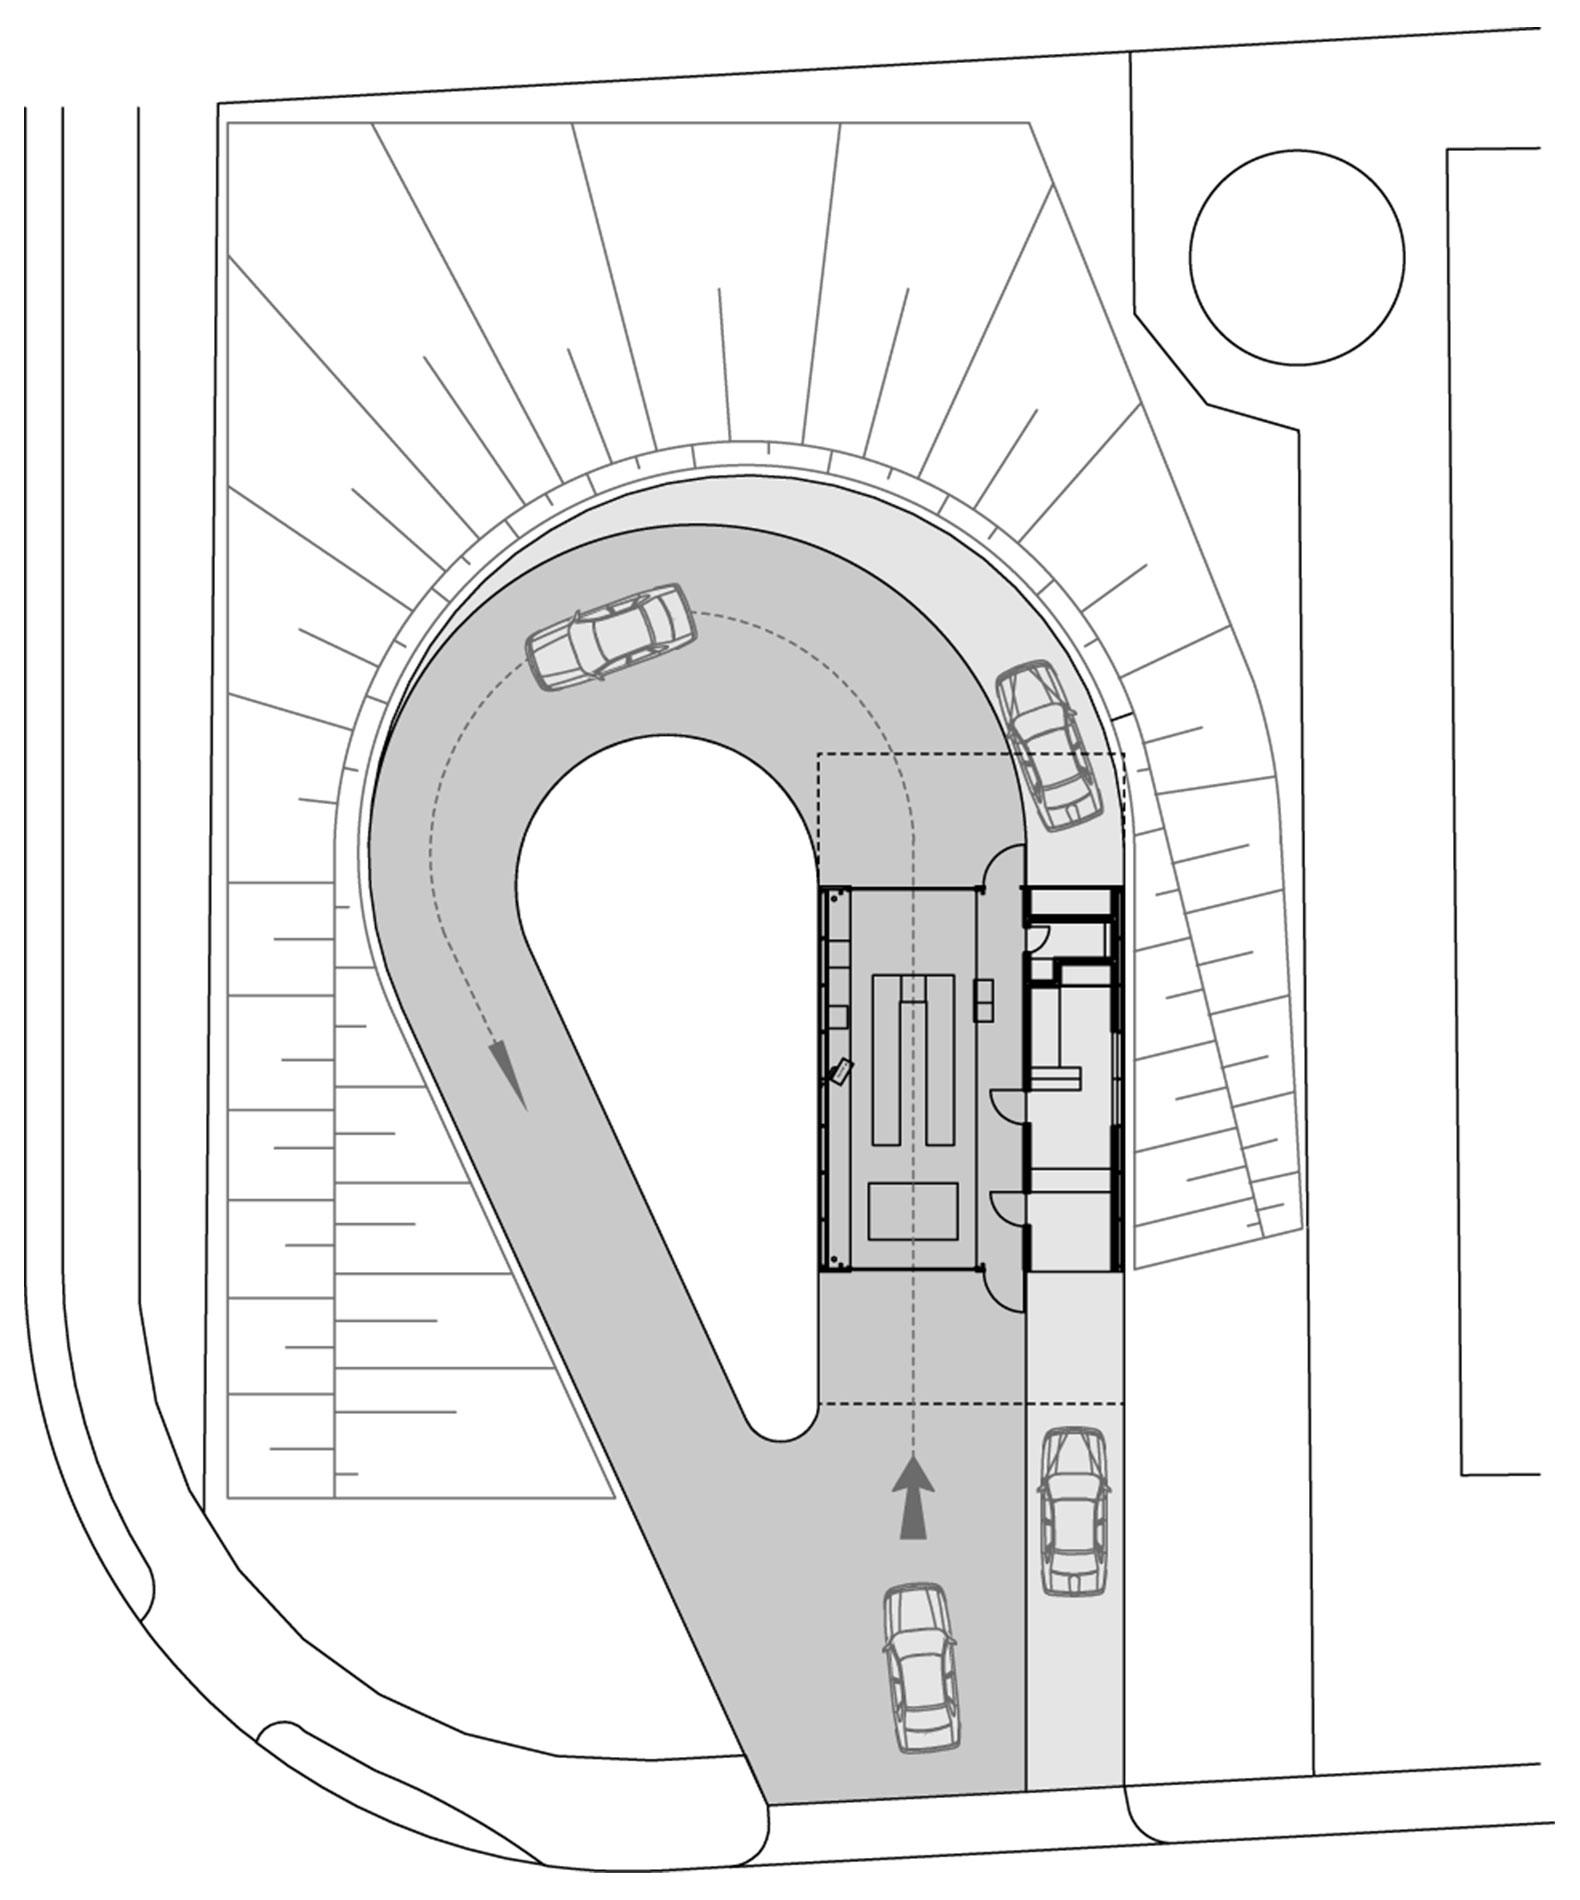 TUEV SUED floor plan